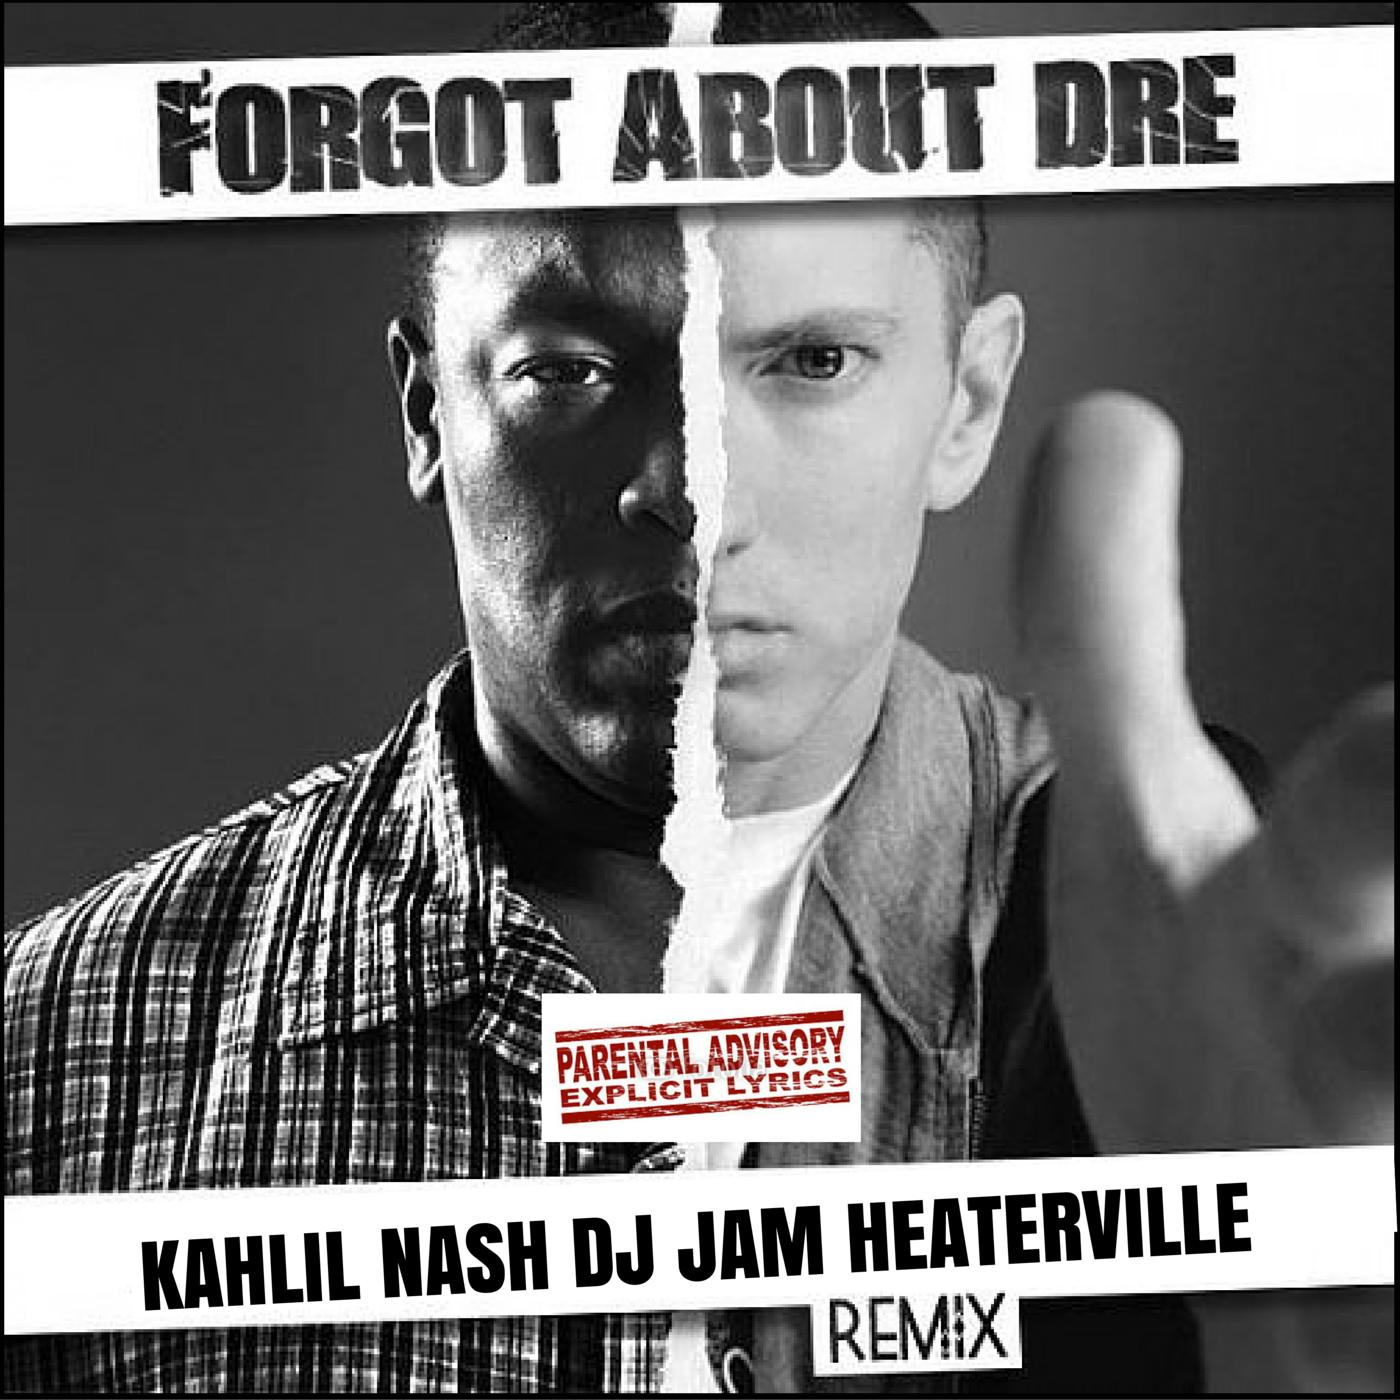 """NEW MUSIC"" Dr Dre ""Forgot About Dre"" (Kahlil Nash DJ Jam HeaterVille remix)"